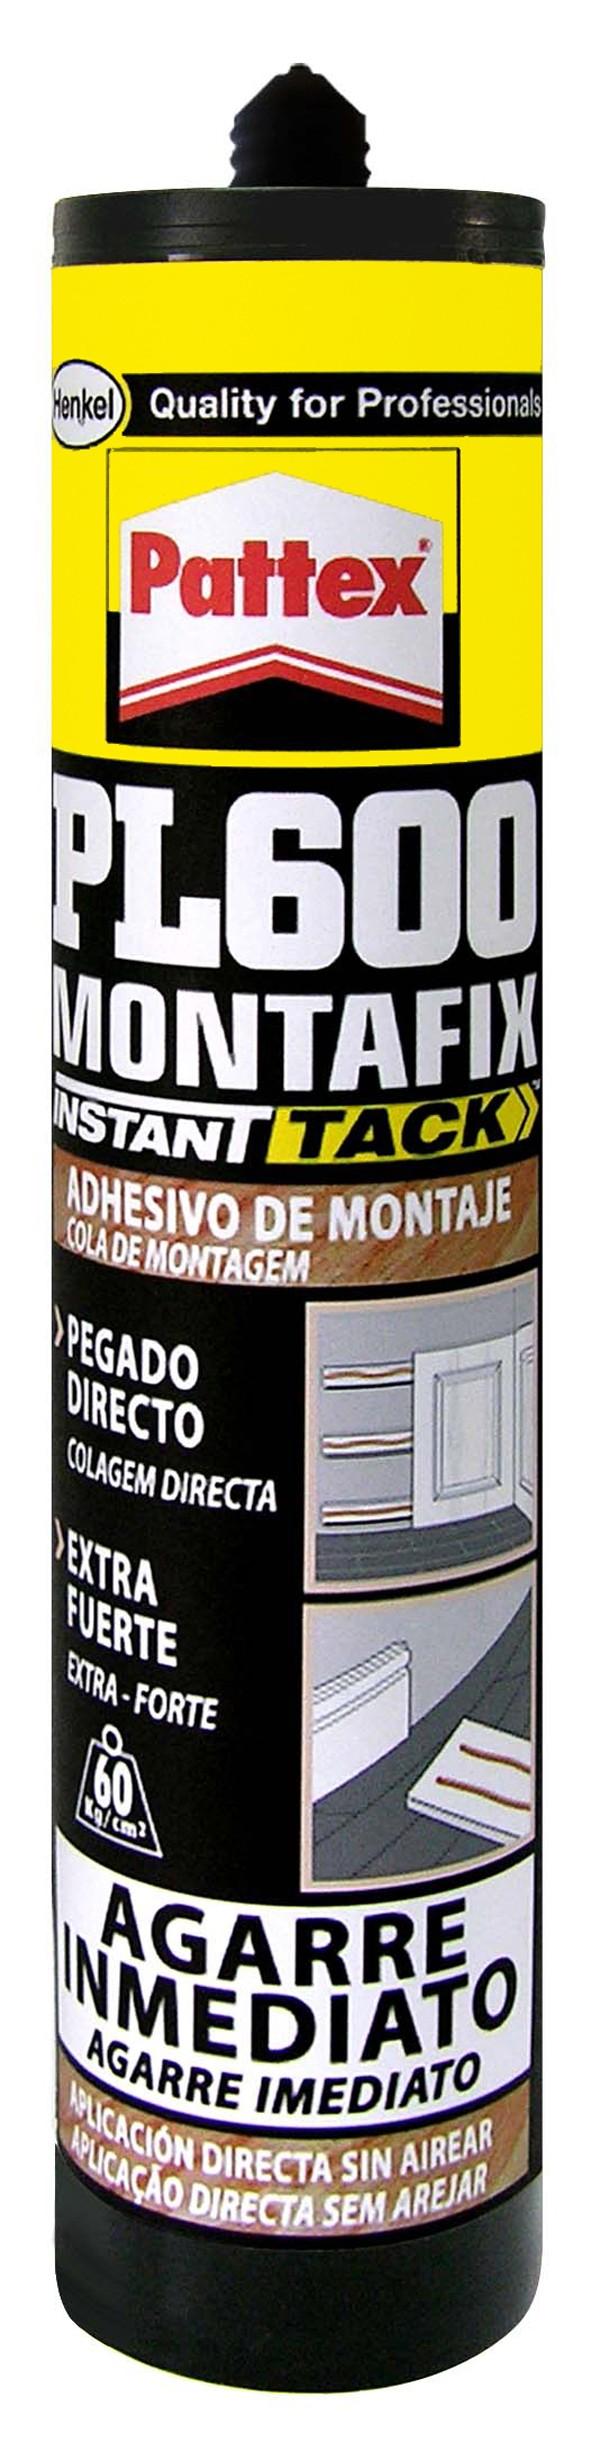 ADHESIVO MONTAJE MONTAFIX 600 PATTEX 300 ML